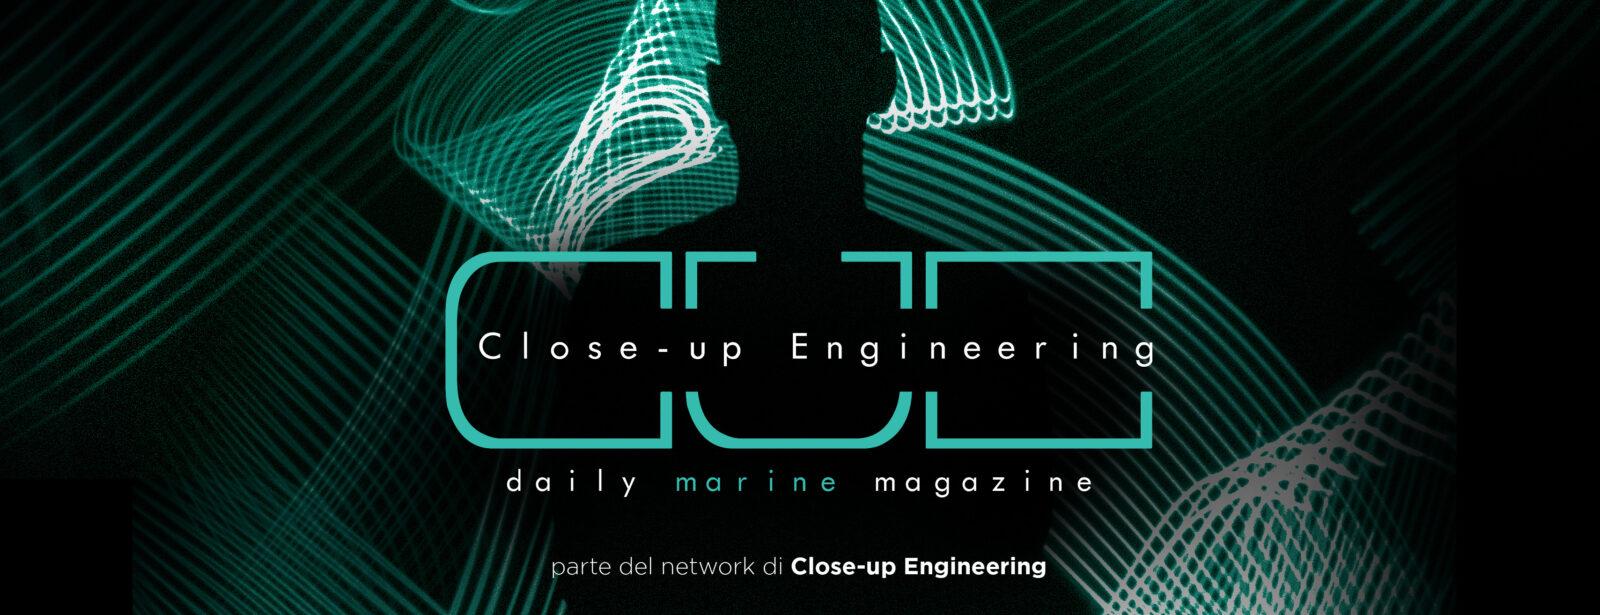 marinecue close-up engineering